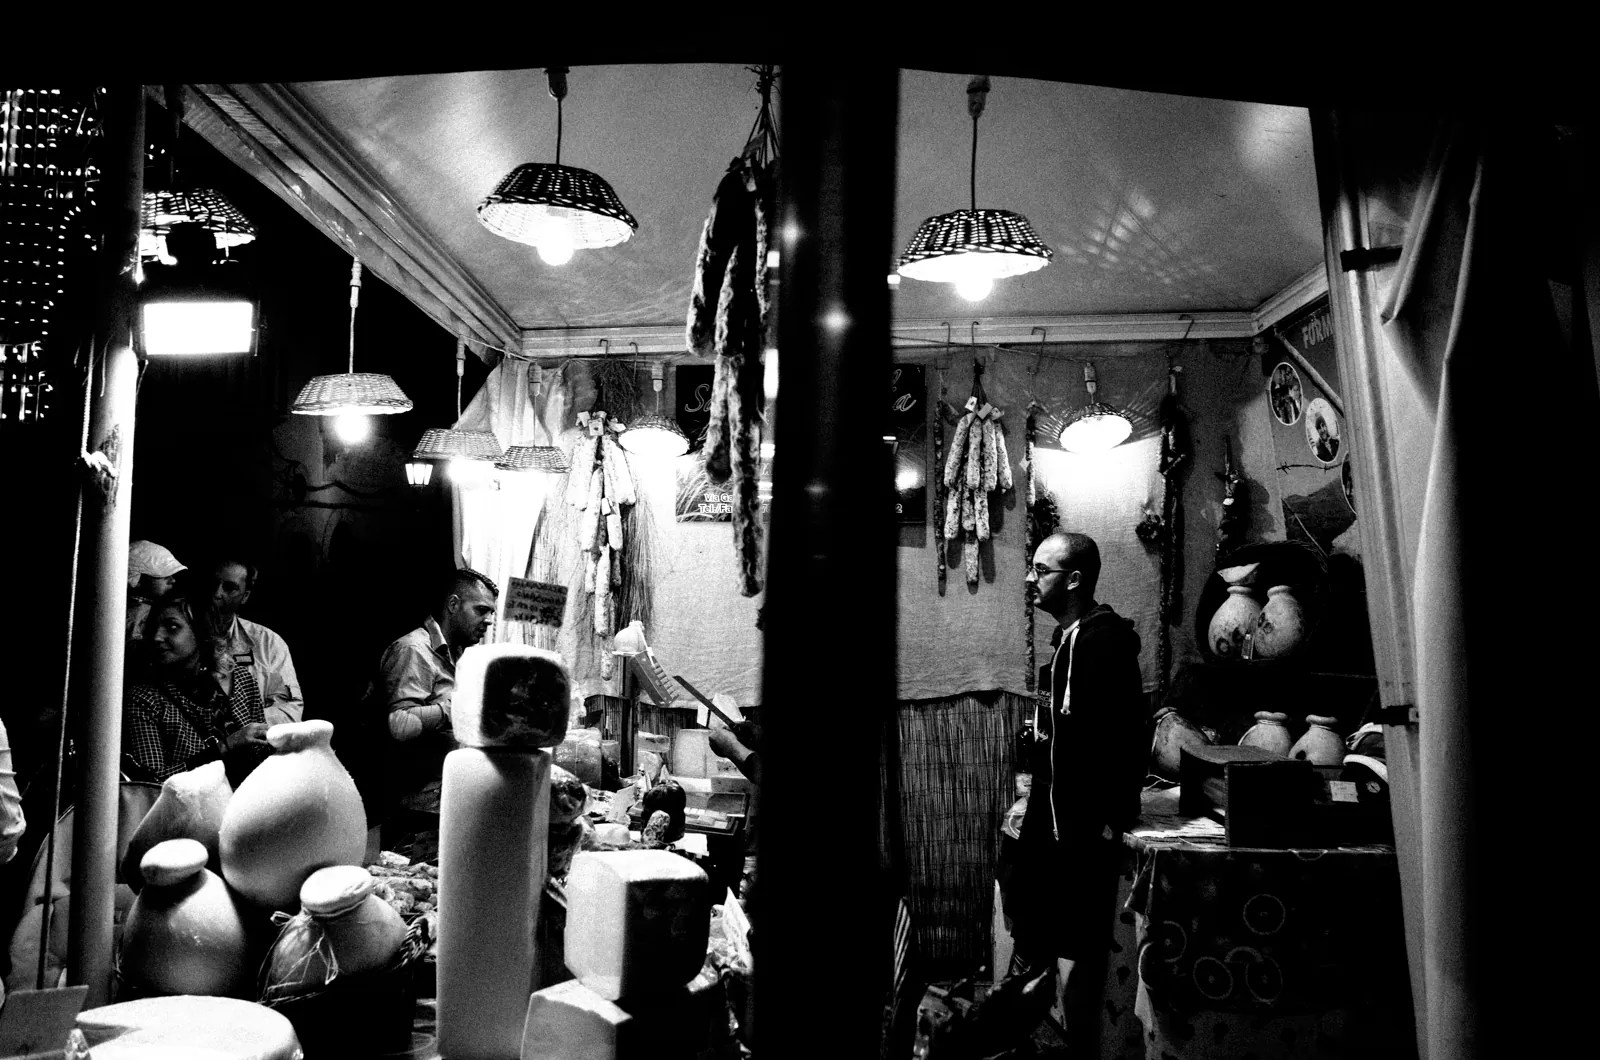 R0006192 - Frapporre in Street Photography - fotostreet.it